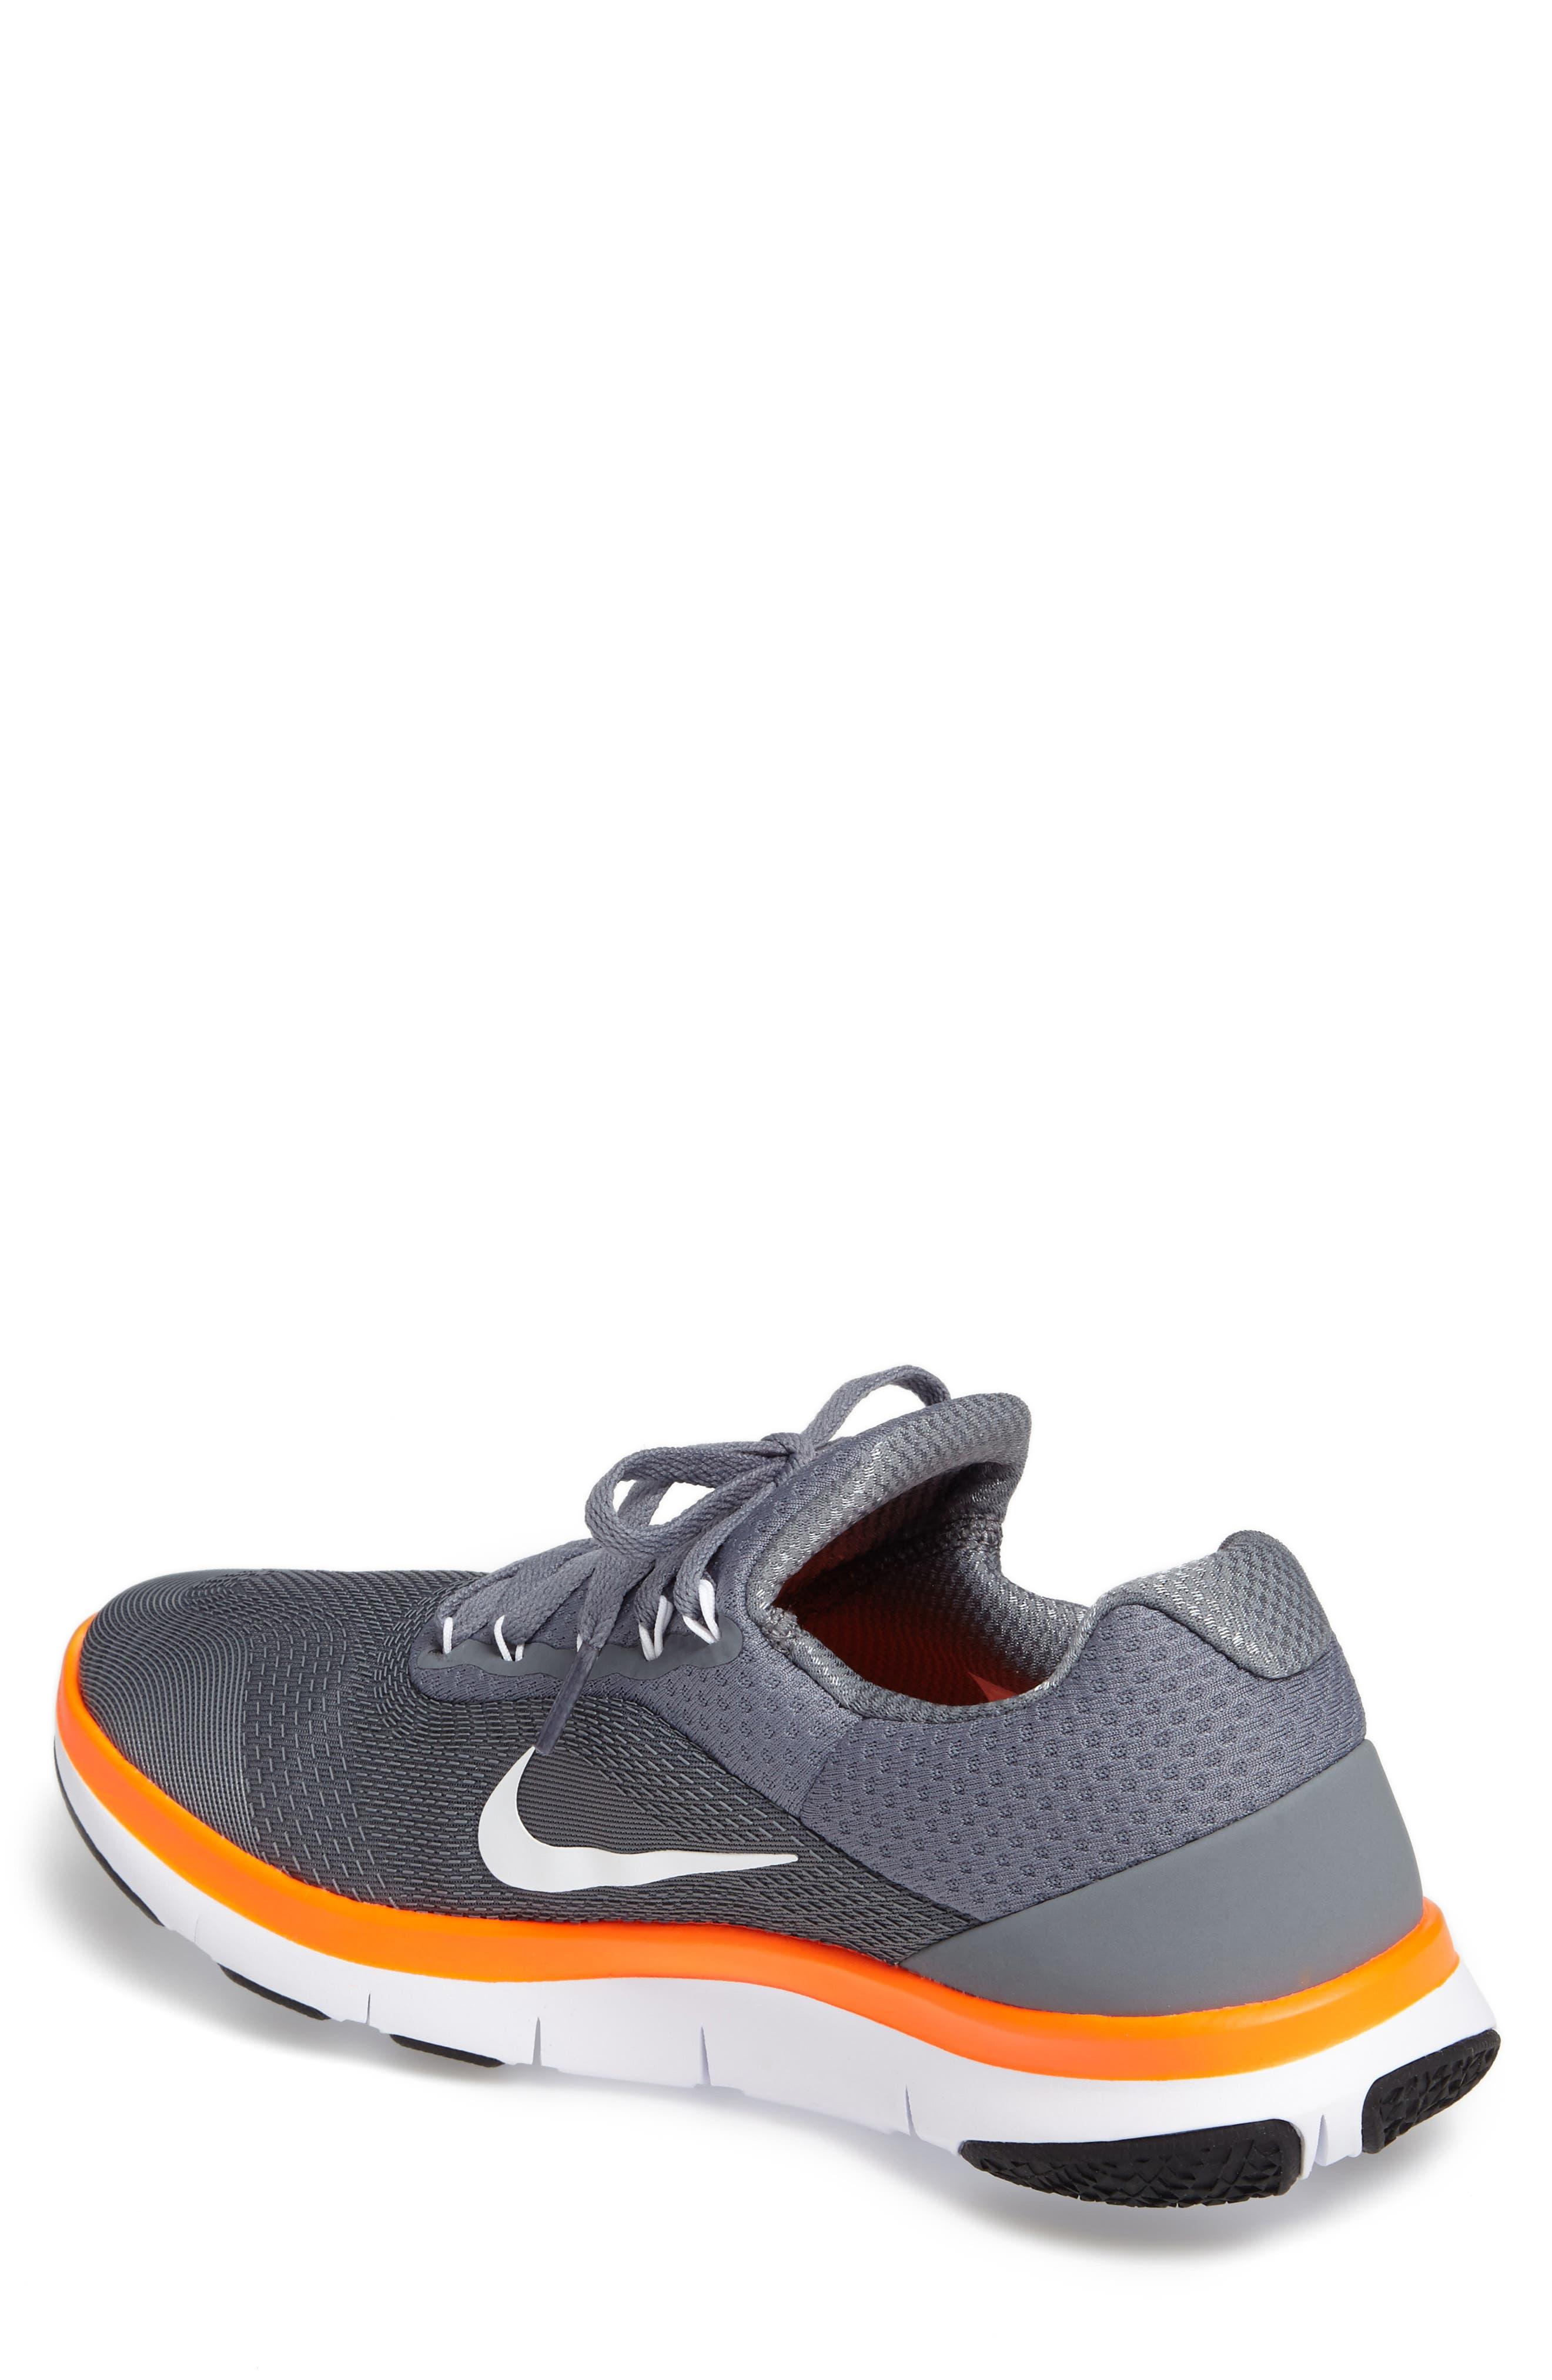 Alternate Image 2  - Nike Free Trainer V7 Training Shoe (Men)